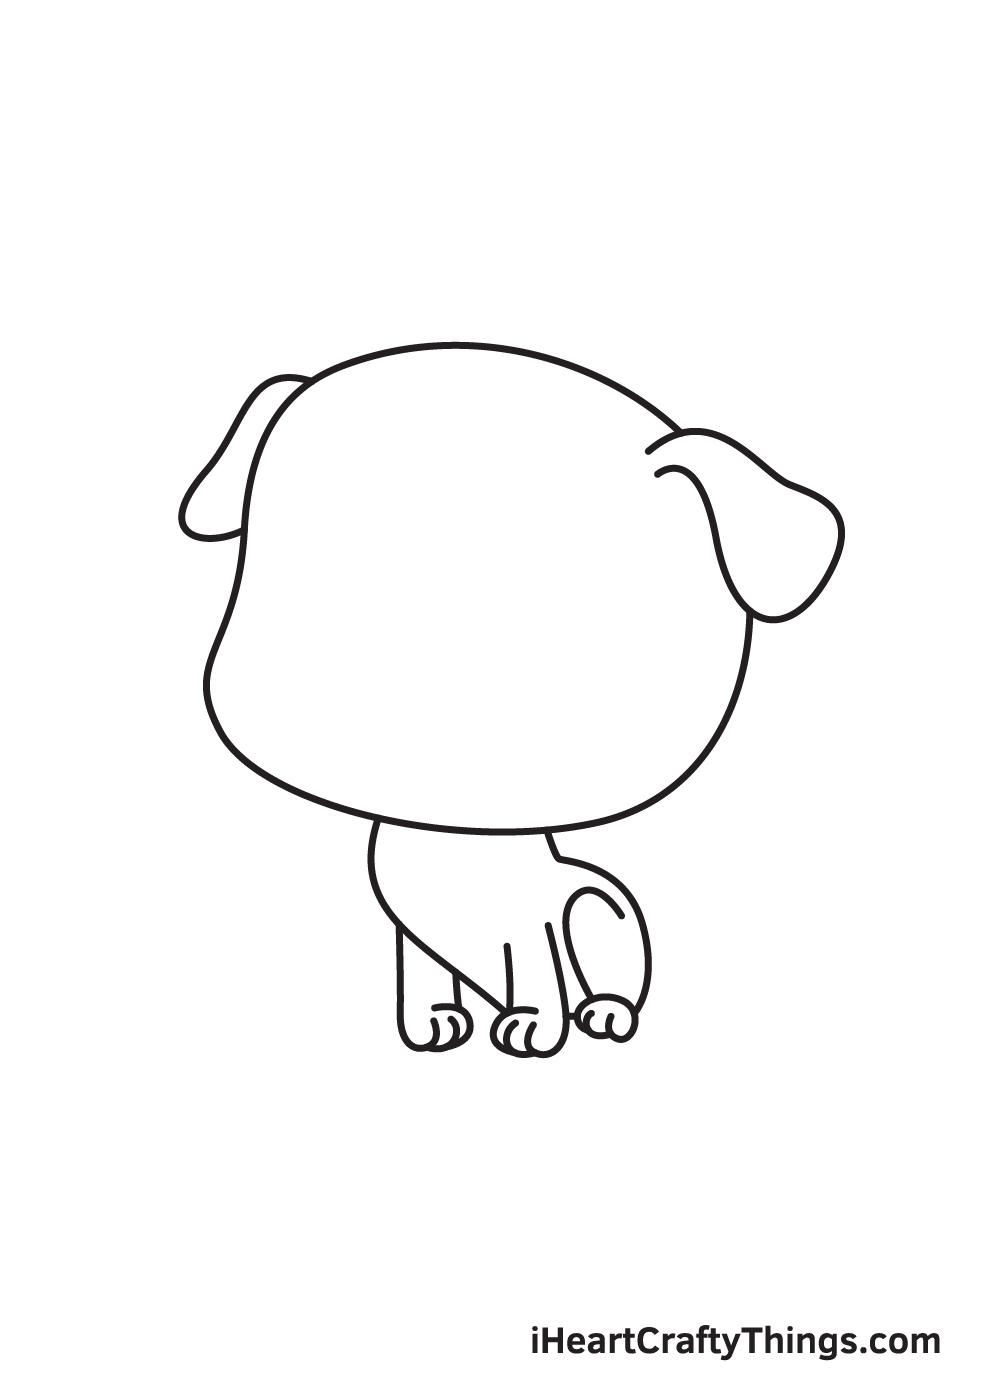 pug drawing step 5